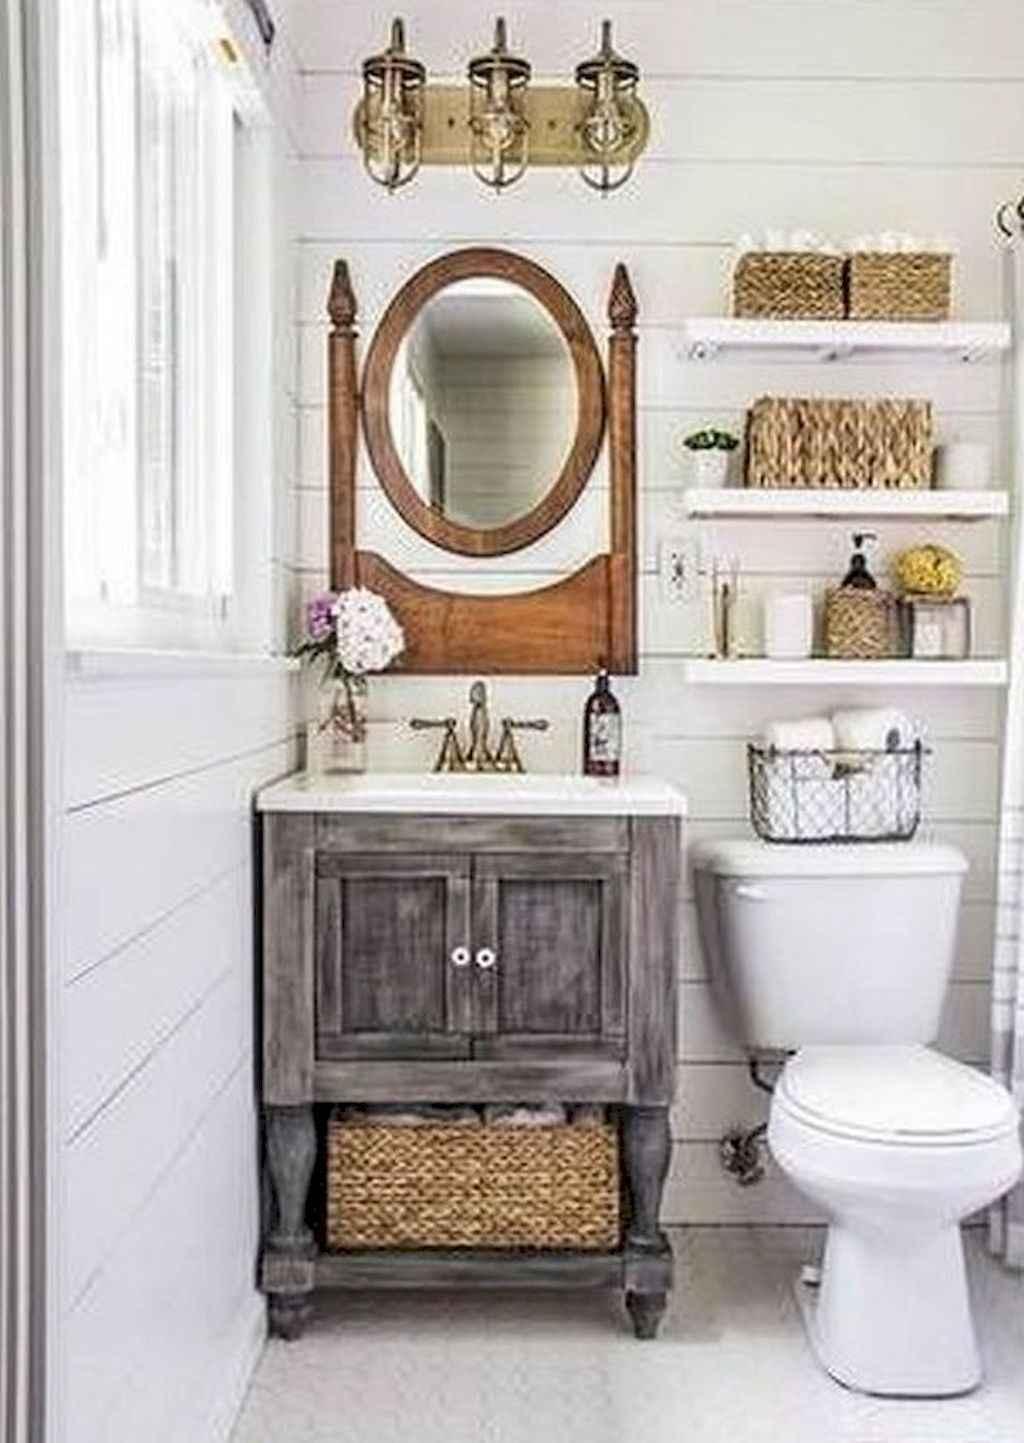 125 awesome farmhouse bathroom vanity remodel ideas (9)